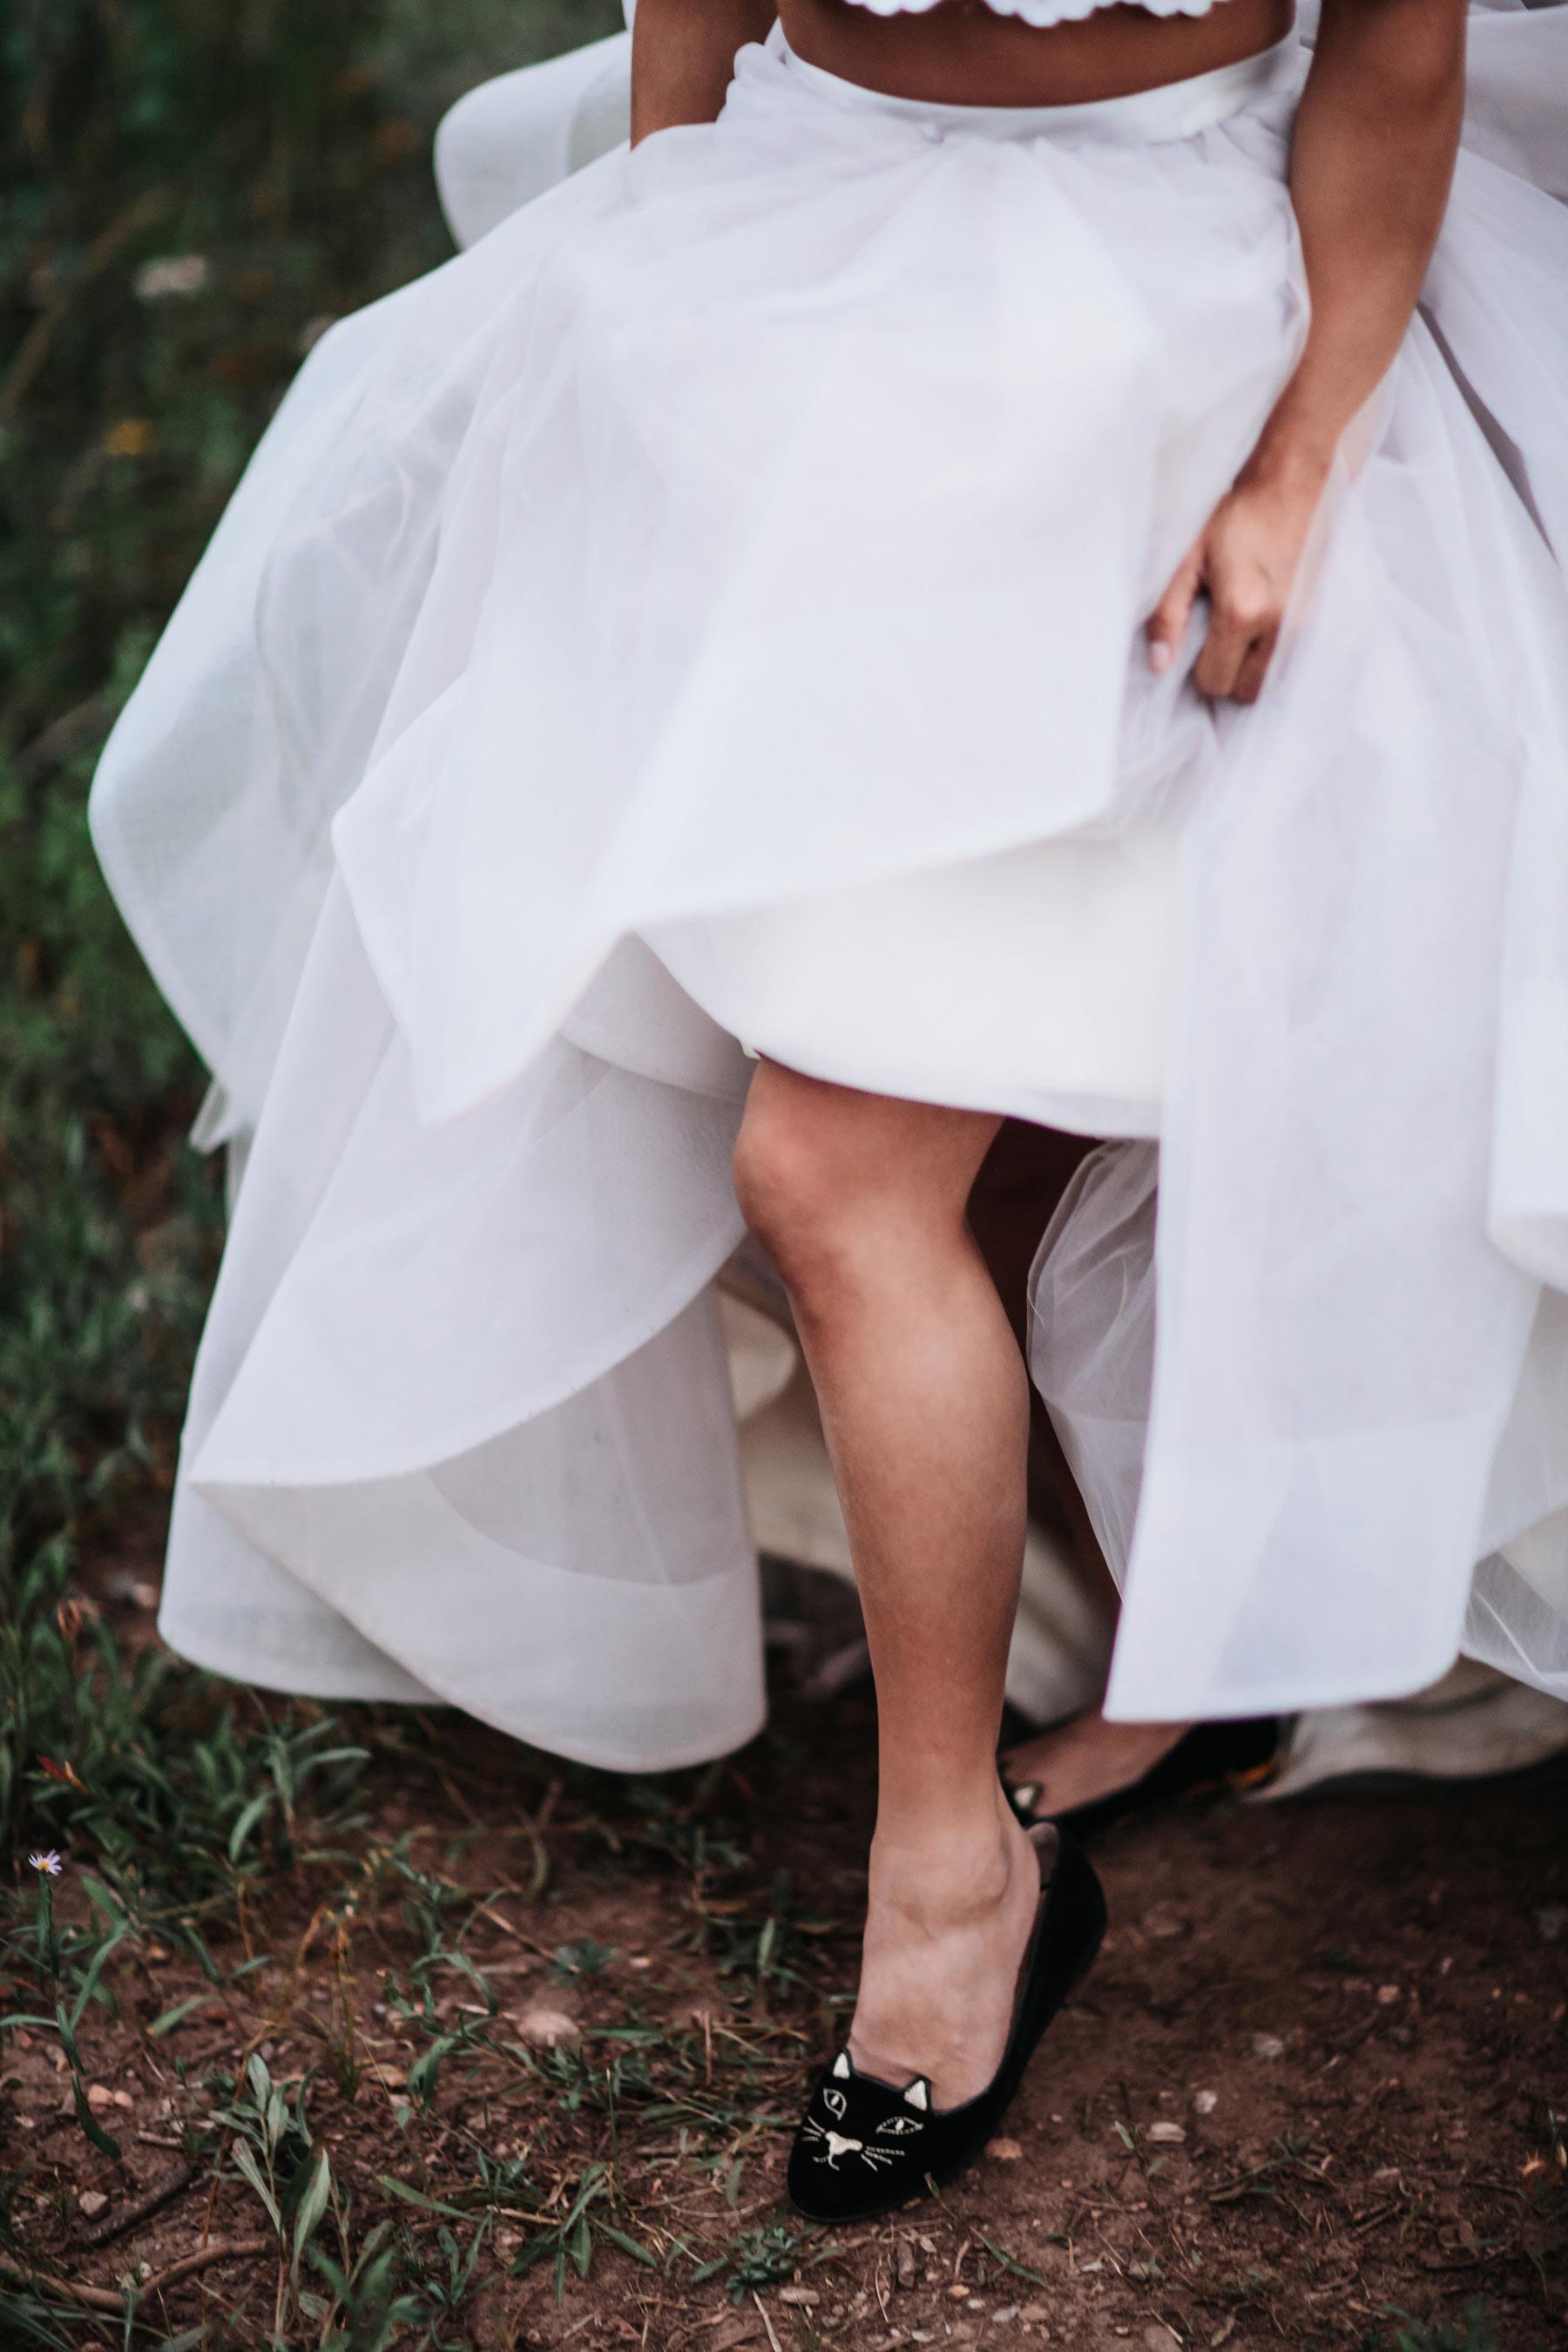 Vail Colorado Wedding Deck_ Kindling Wedding Photography83.JPG